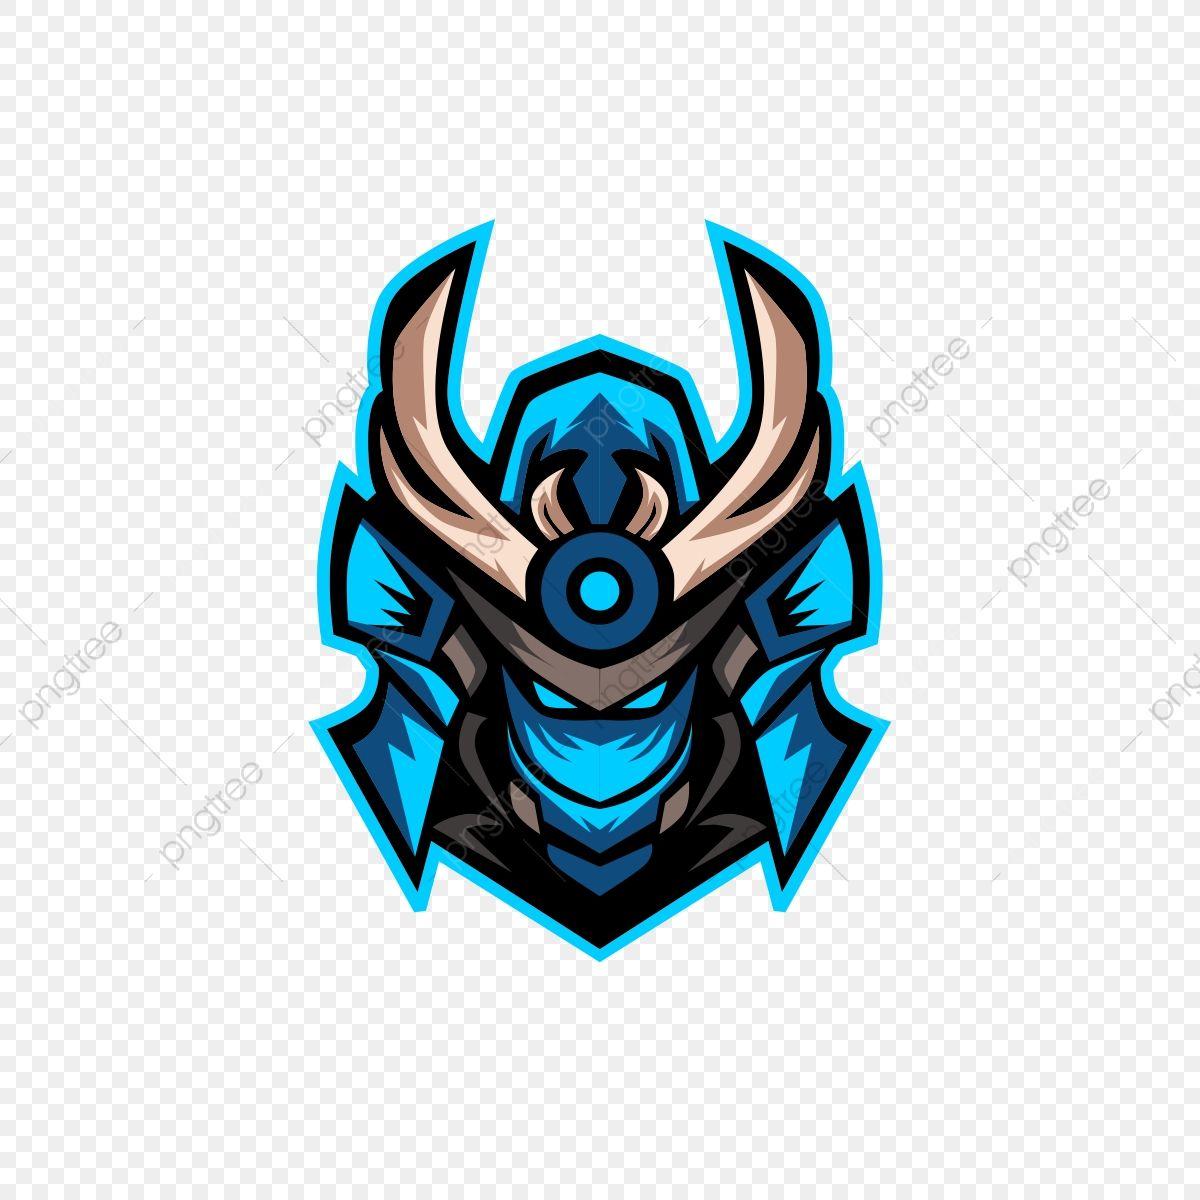 Download This Blue Samurai Head Esports Logo Free Logo Design Template Illustration Vector Masc Logo Design Free Templates Logo Design Free Game Logo Design